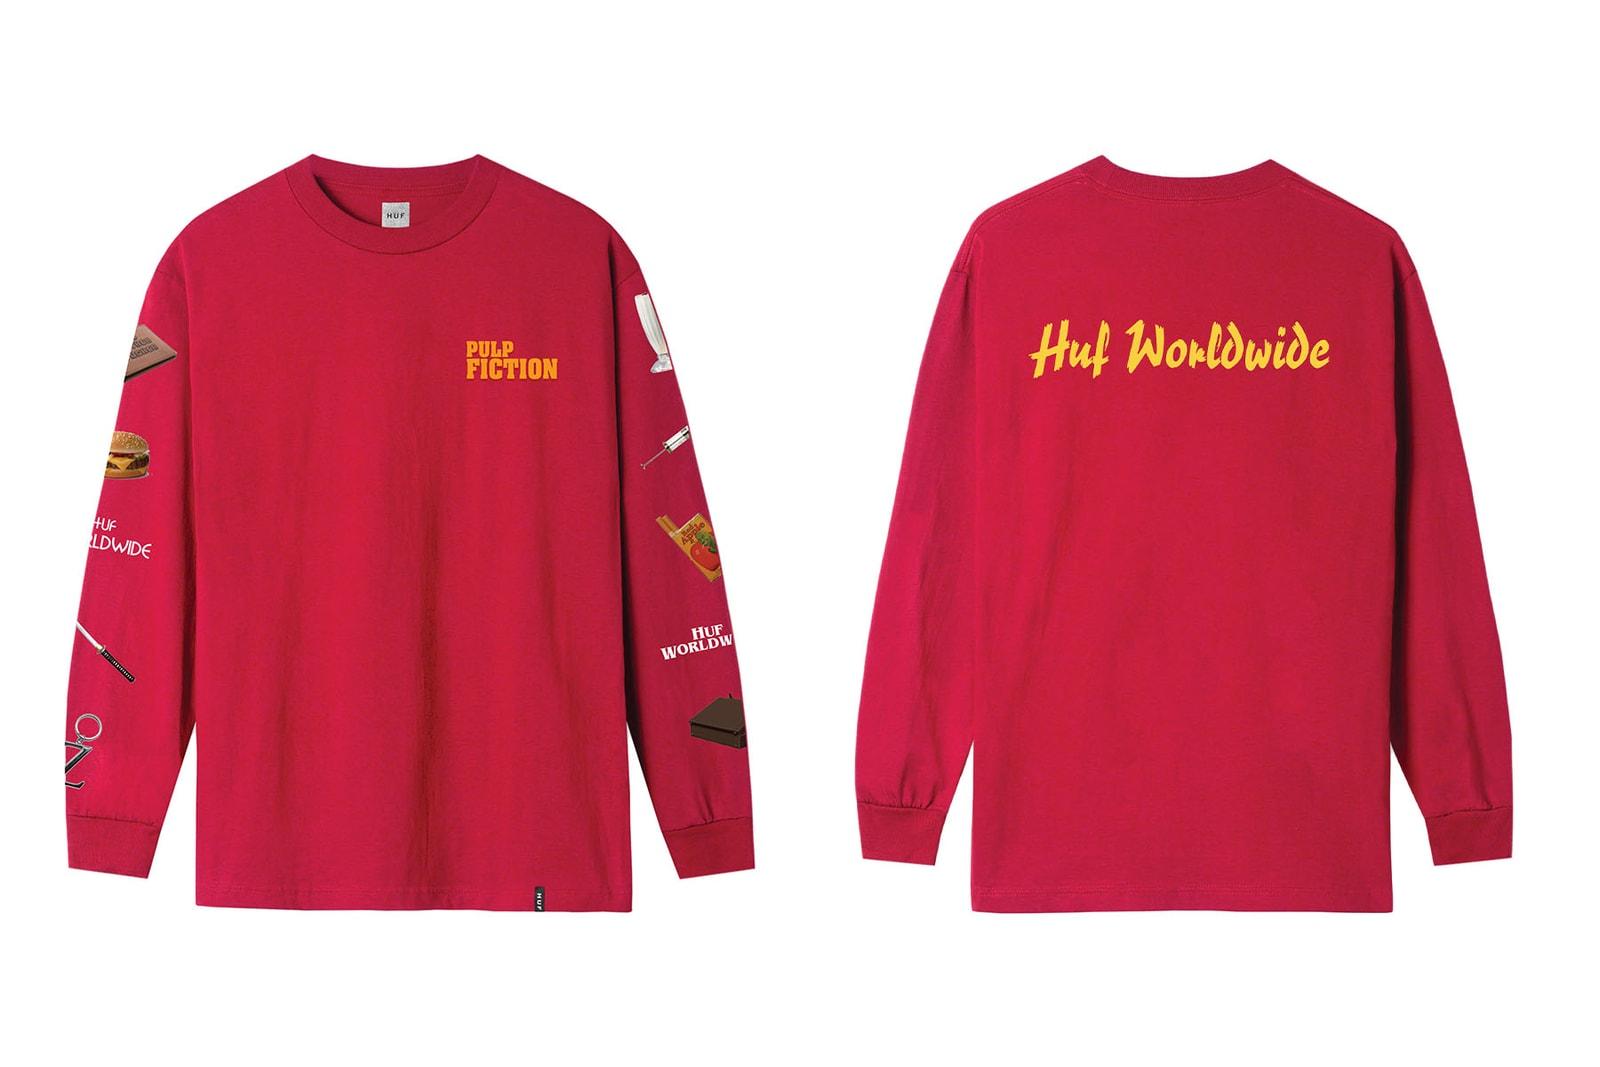 HUF がタランティーノの代表作『パルプ・フィクション』の25周年記念コレクションをリリース HUF releases 25th anniversary collection for Quentin Tarantino's movie『Pulp Fiction』